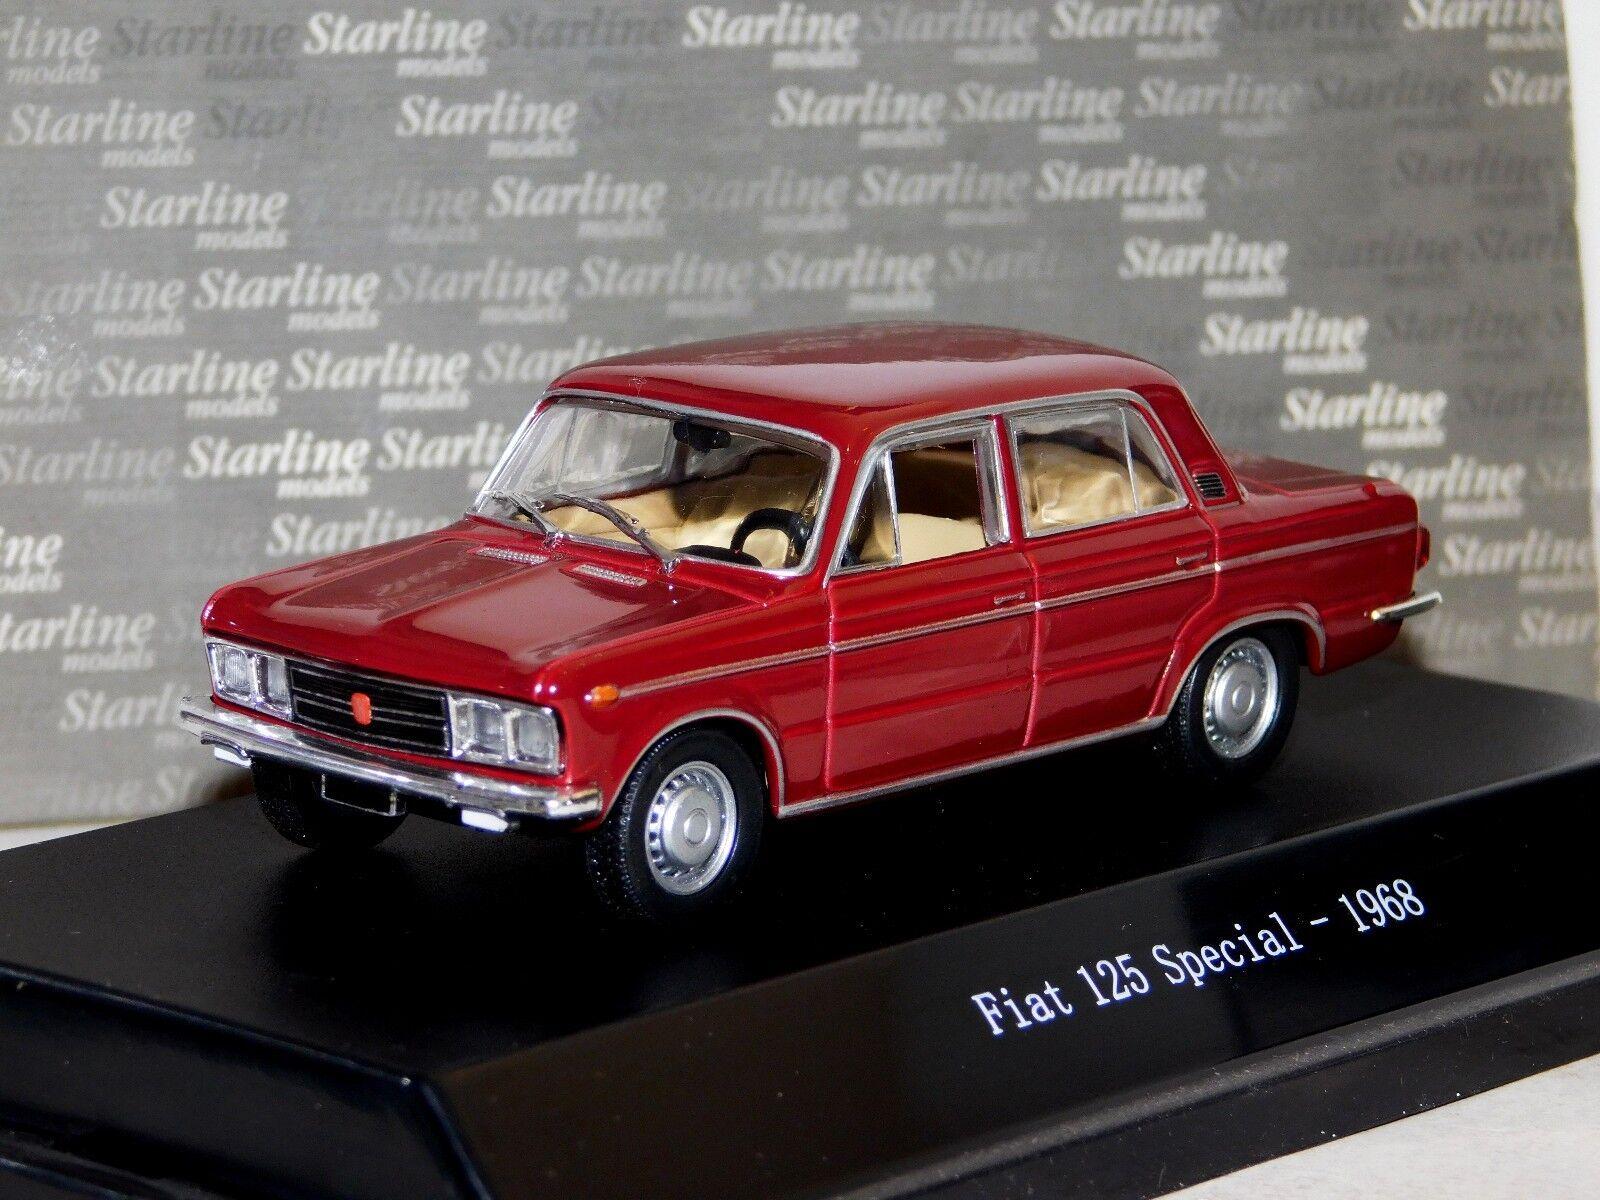 FIAT 125 SPECIAL 1968 STARLINE 1 43